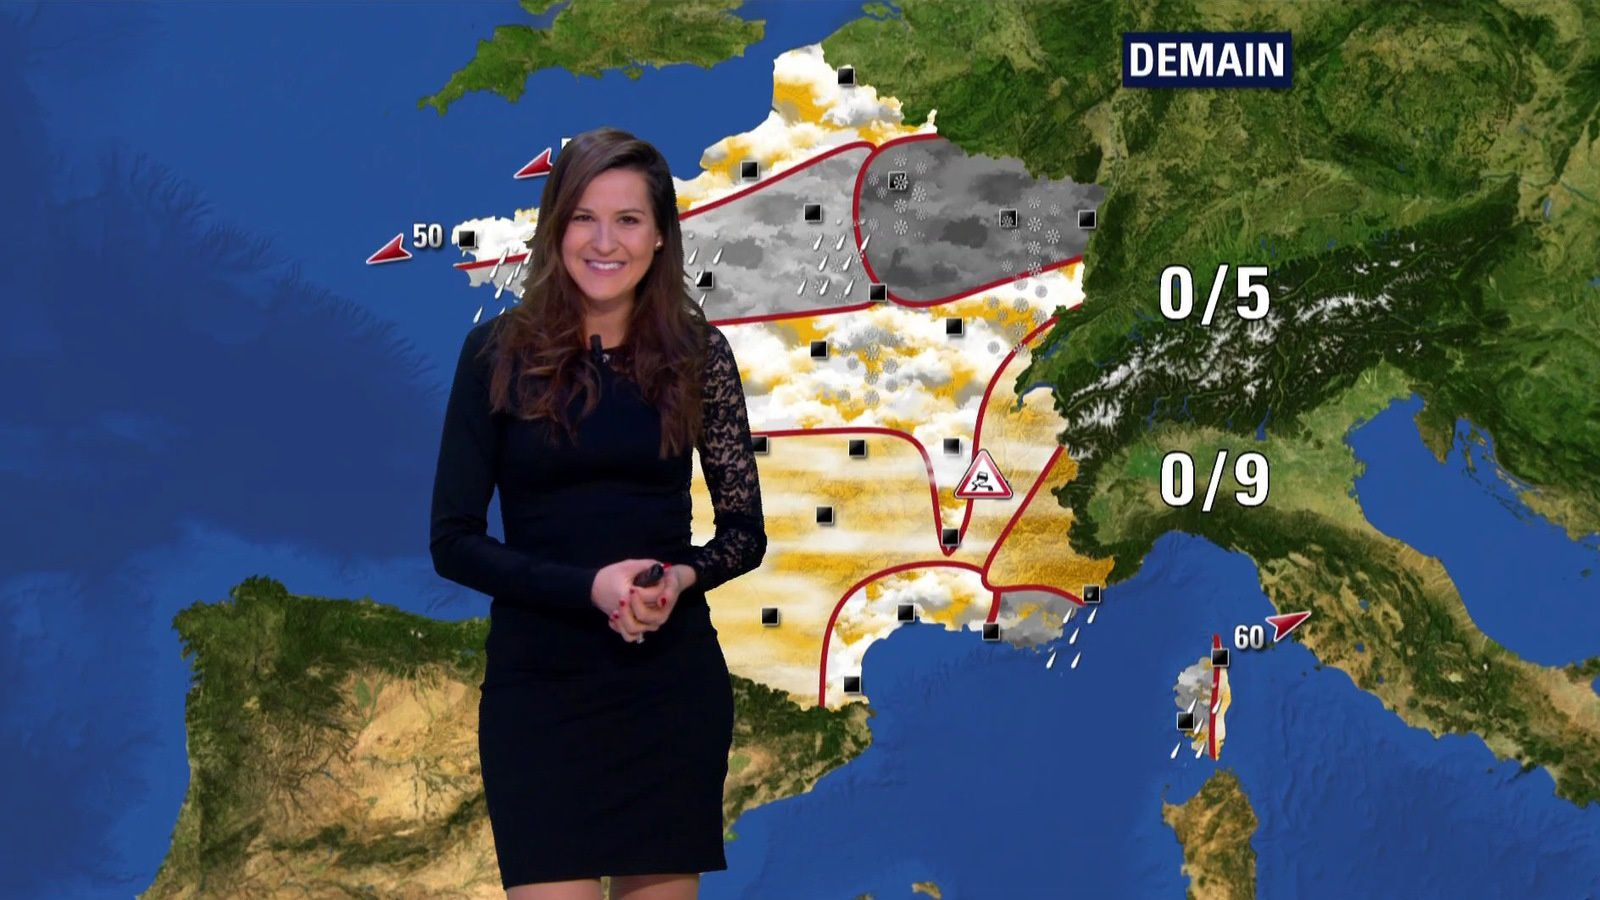 �5 �3 DANIELA PREPELIUC @Dana_Prepy @JohannaCarlosD8 pour LA METEO ce matin @BFMTV #vuesalatele